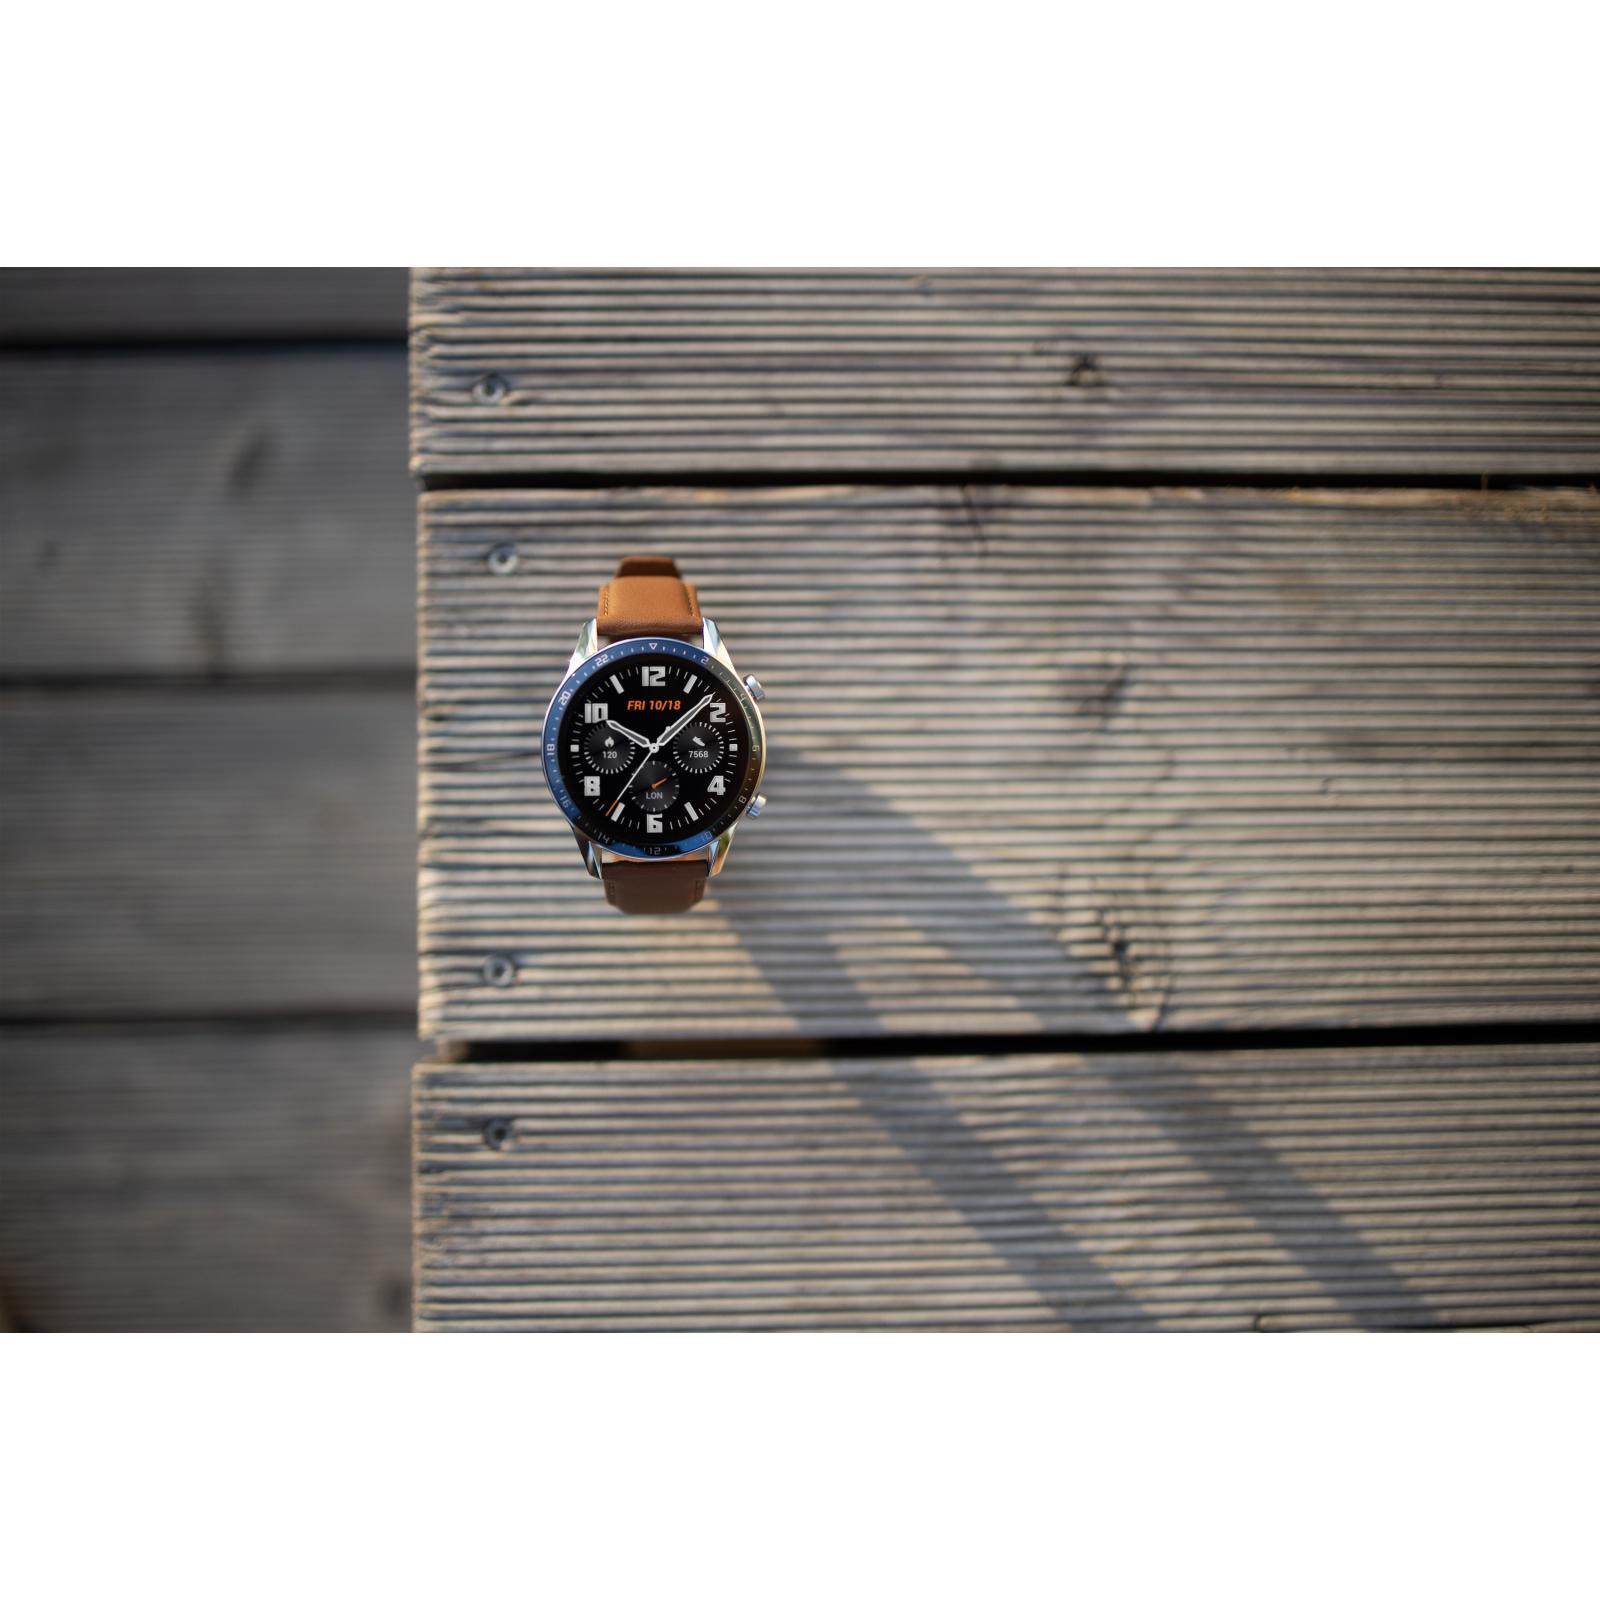 Смарт-часы Huawei Watch GT 2 46mm Classic Silver BROWN шкіра (Latona-B19V) (55024470) изображение 8